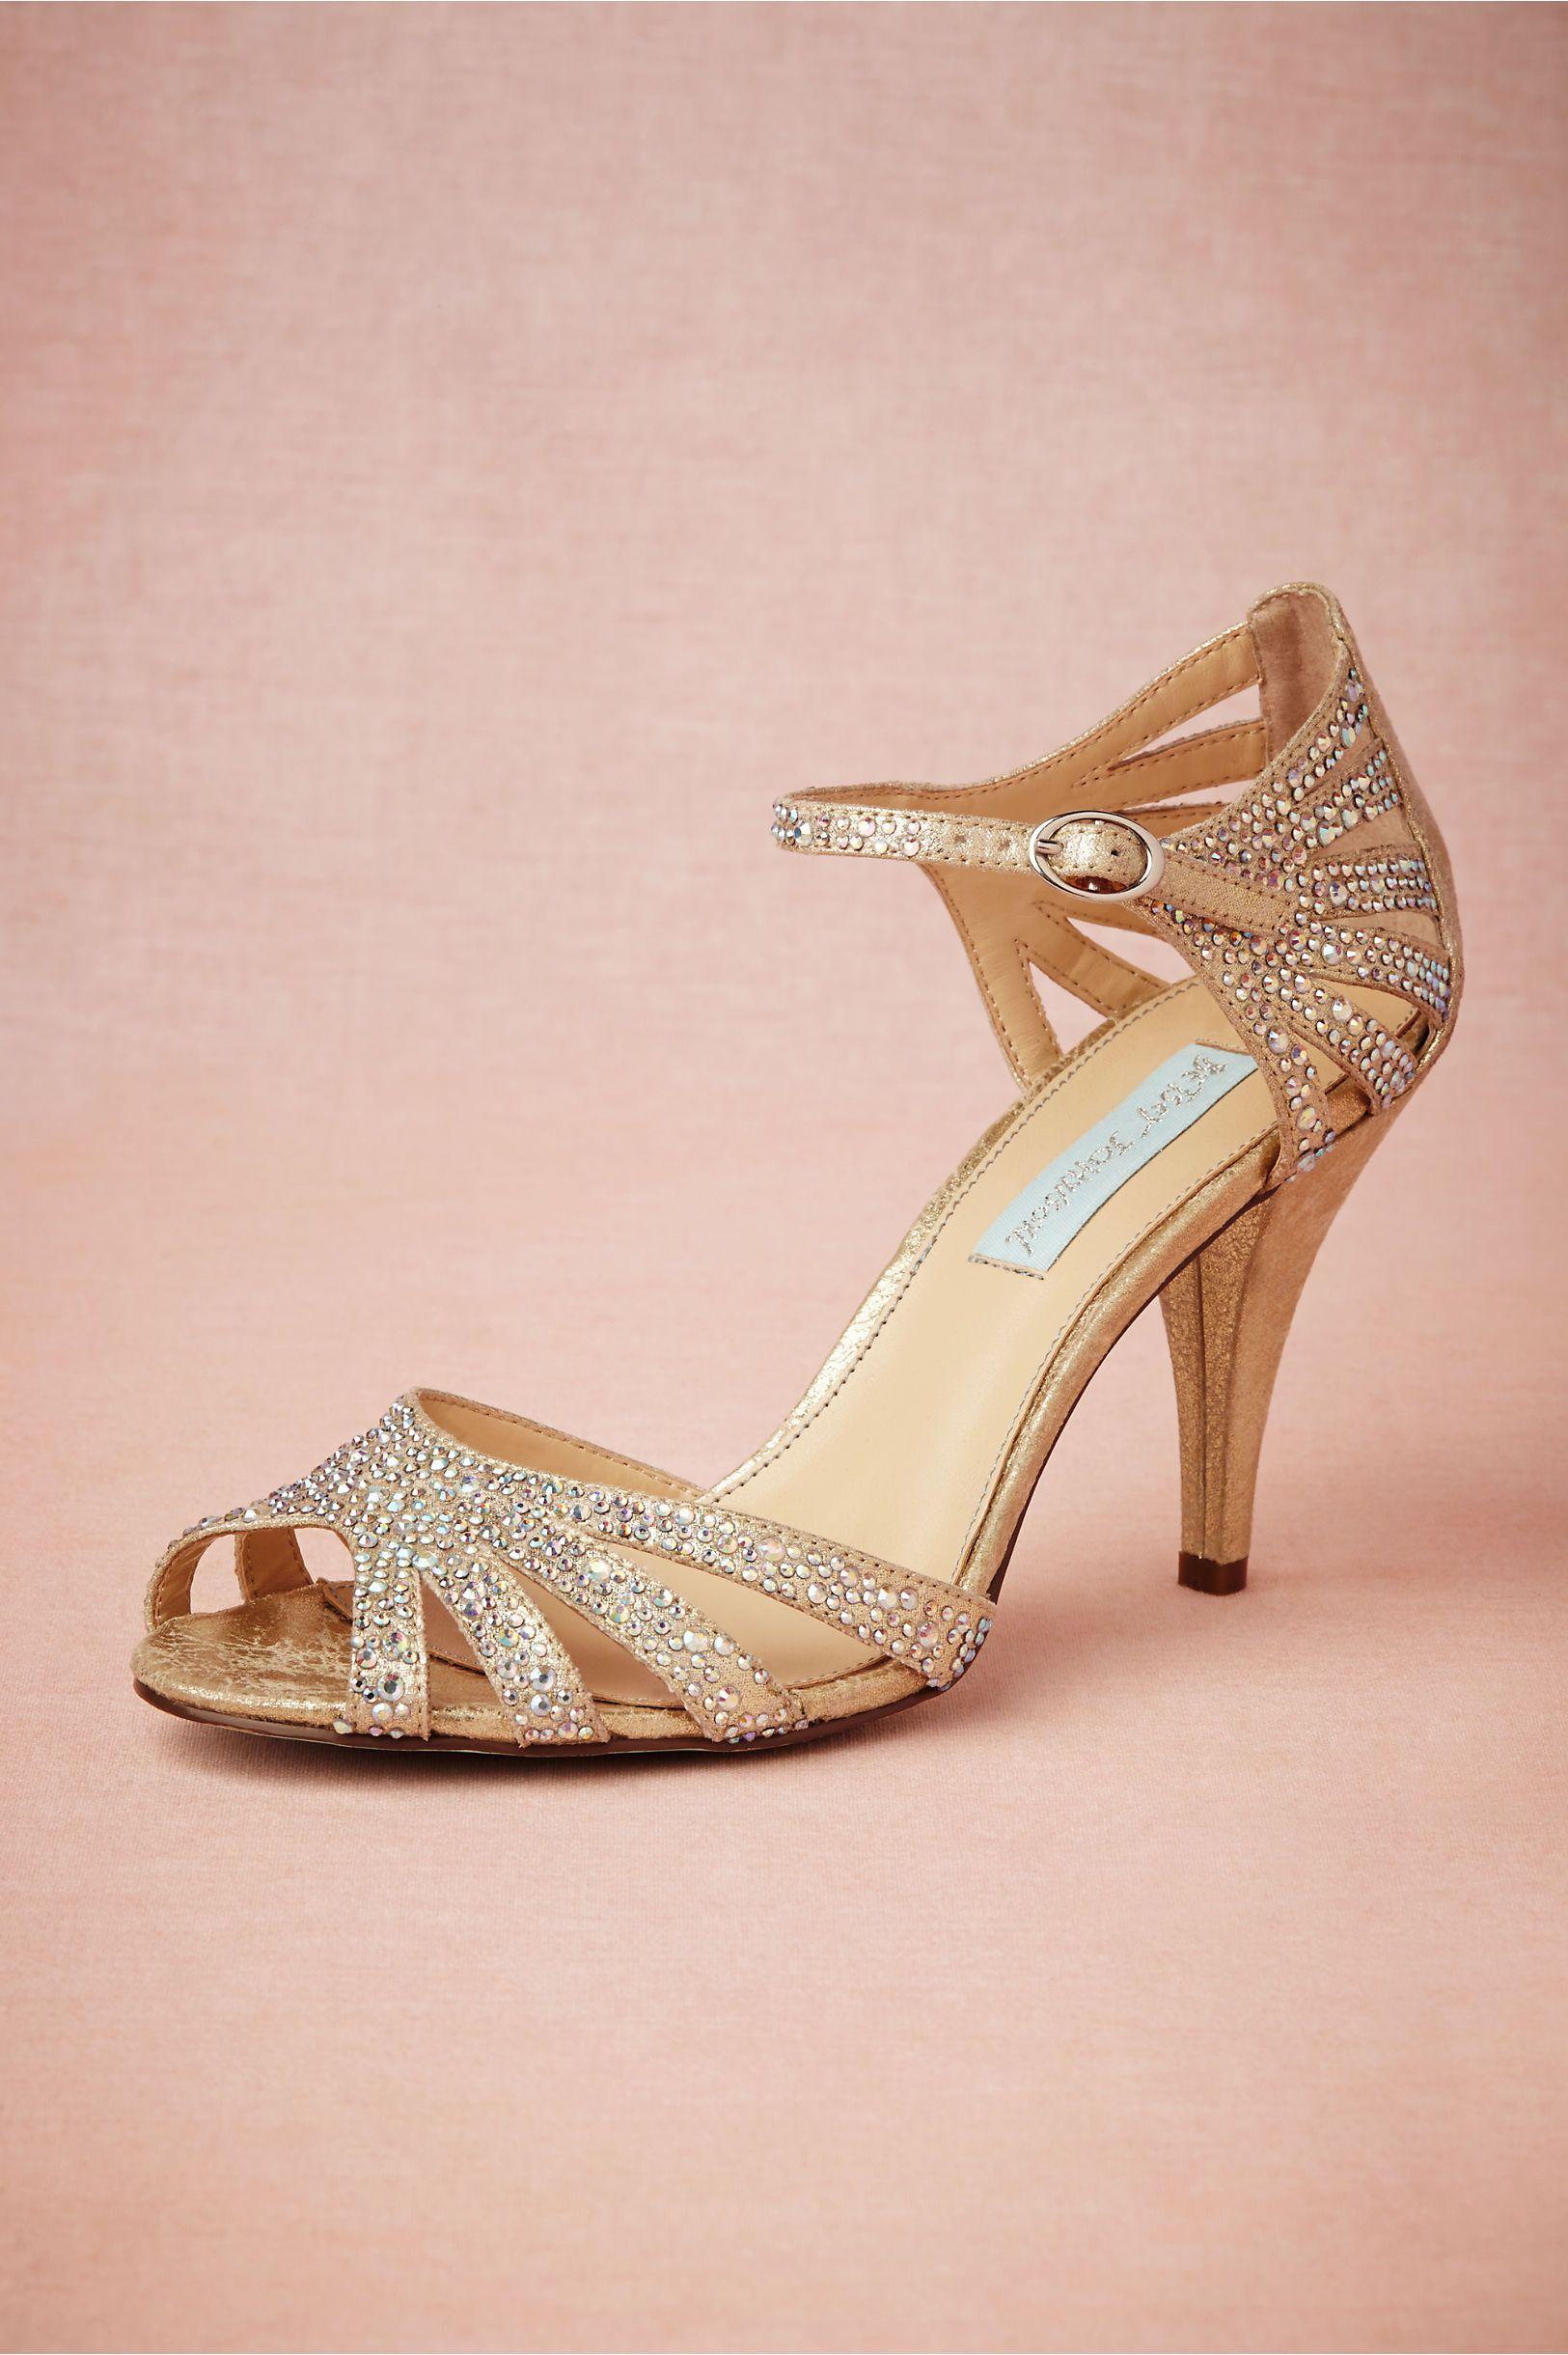 Bridal Shoe Champagne Sparkle Heels